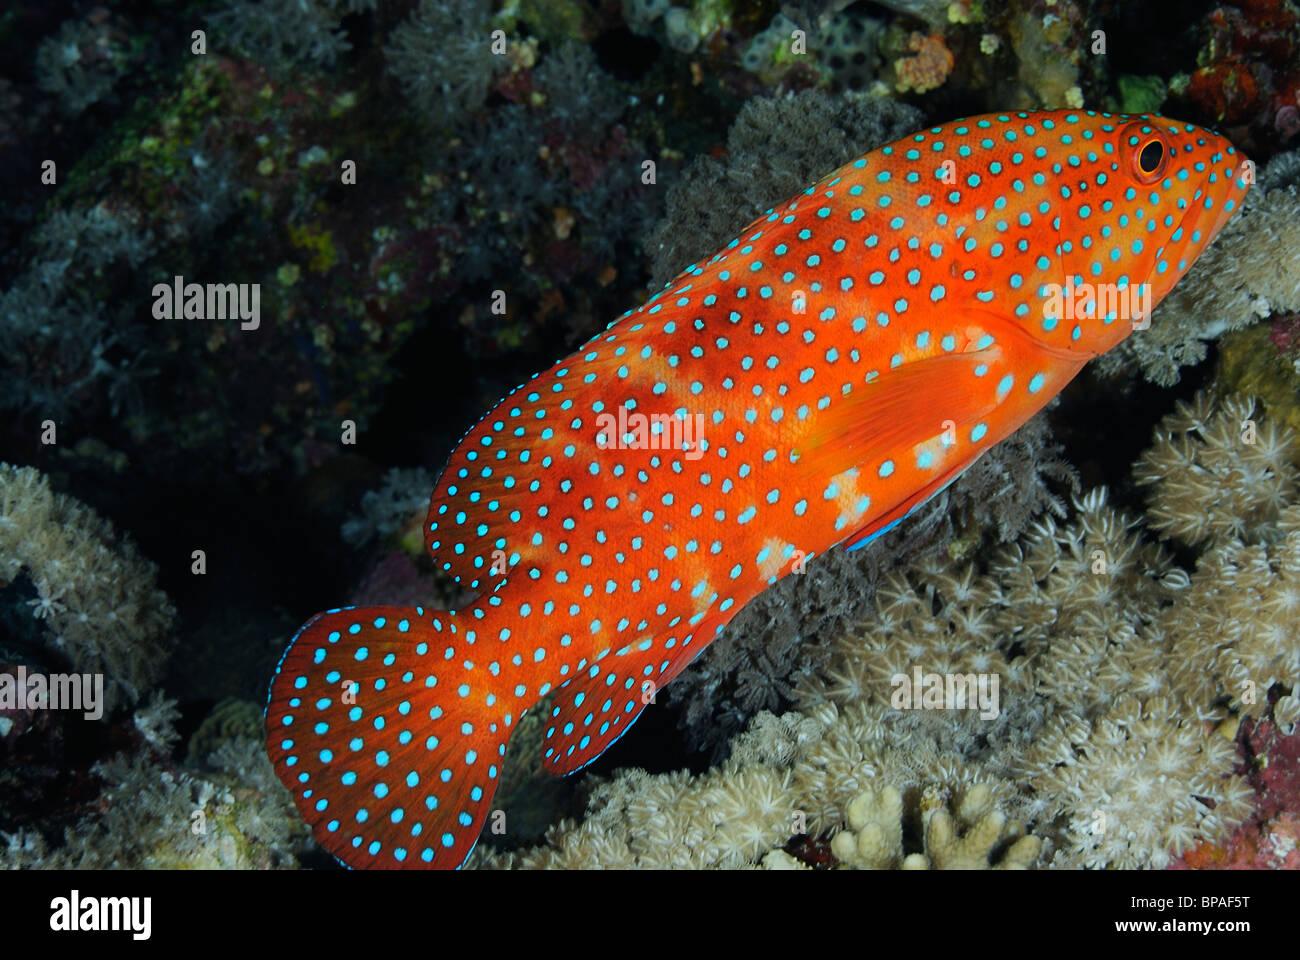 Coral Grouper Fish Scientific Name Stock Photos & Coral Grouper Fish ...